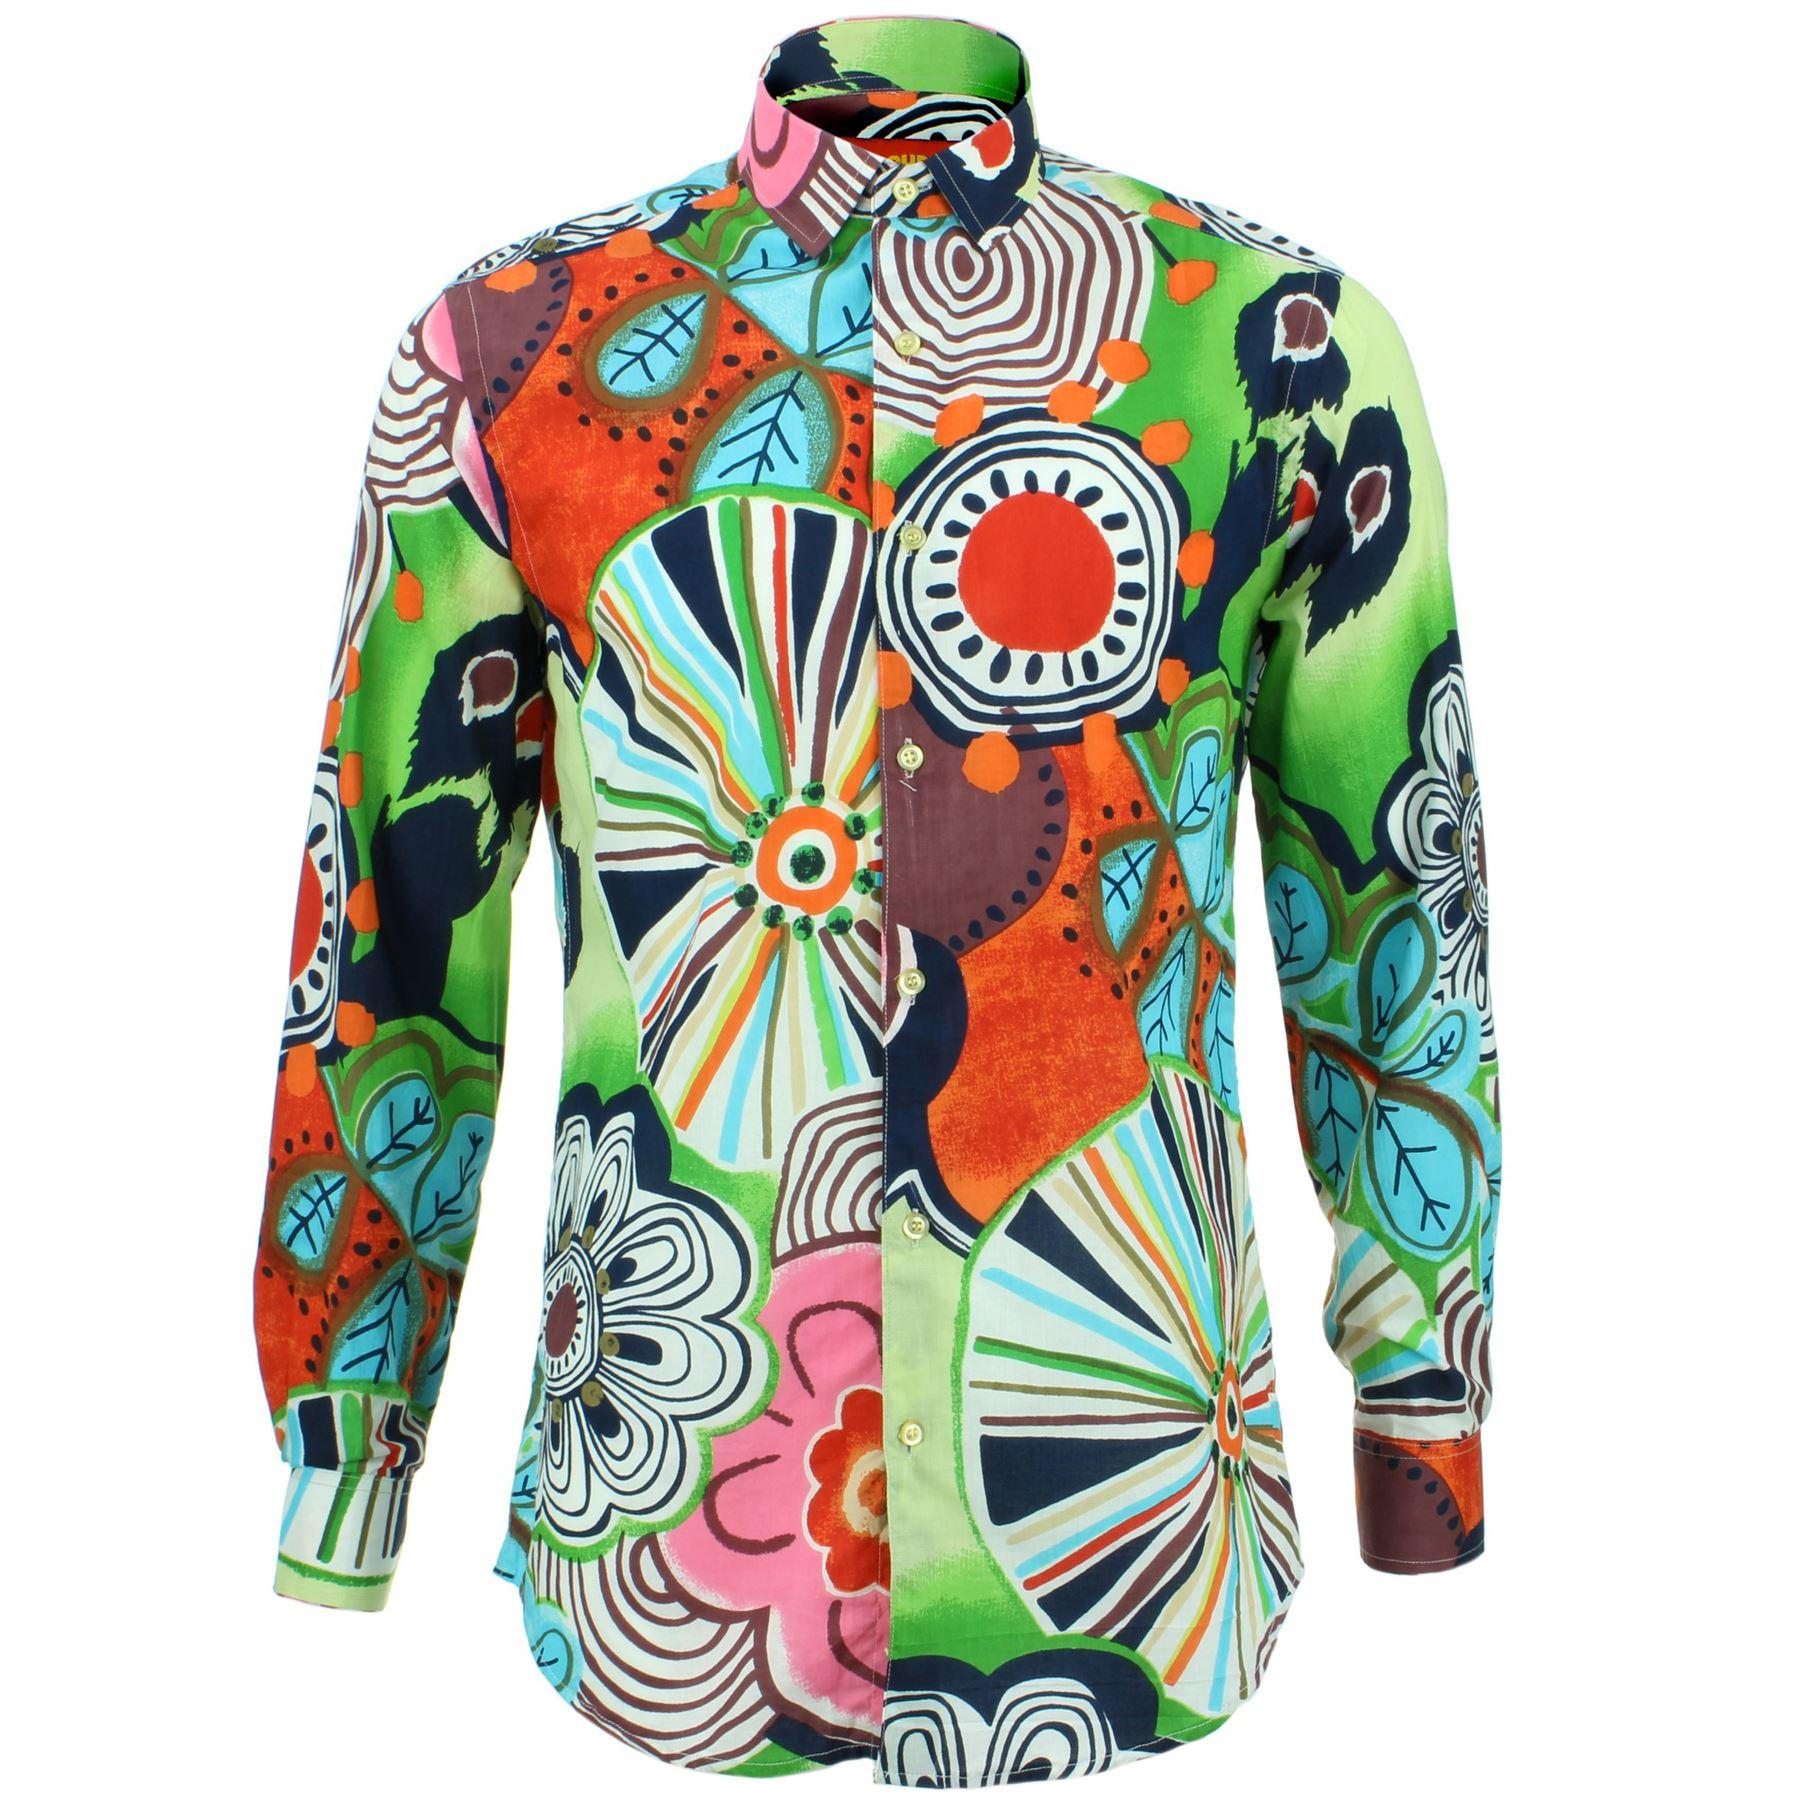 Mens Shirt Loud Originals TAILORED FIT Floral Orange Retro Psychedelic Fancy